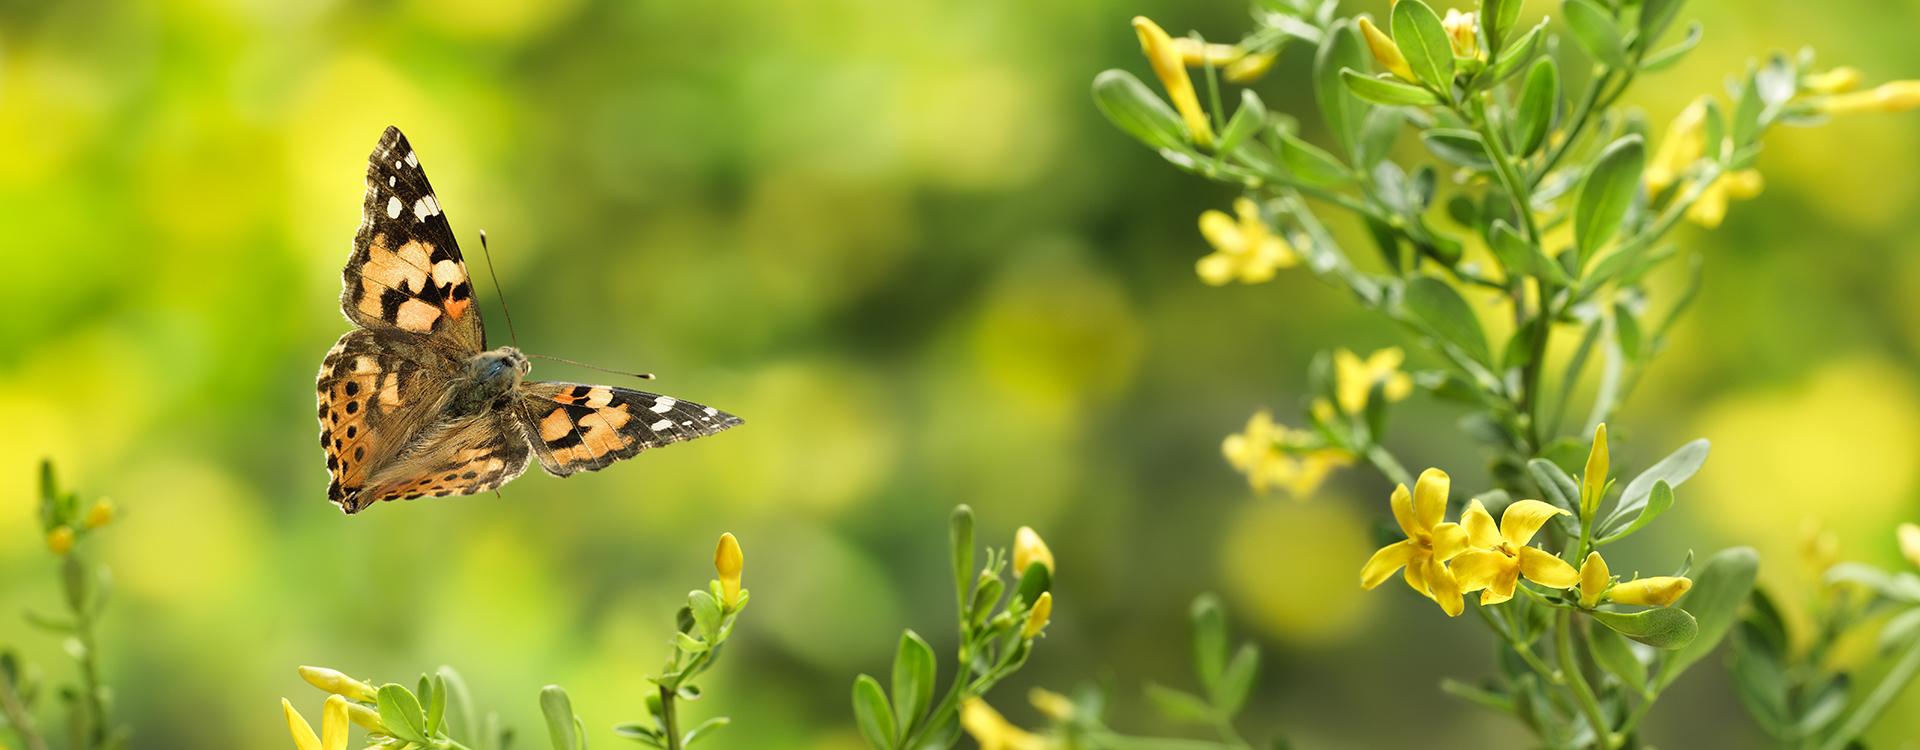 papillon_nature vegetal IO